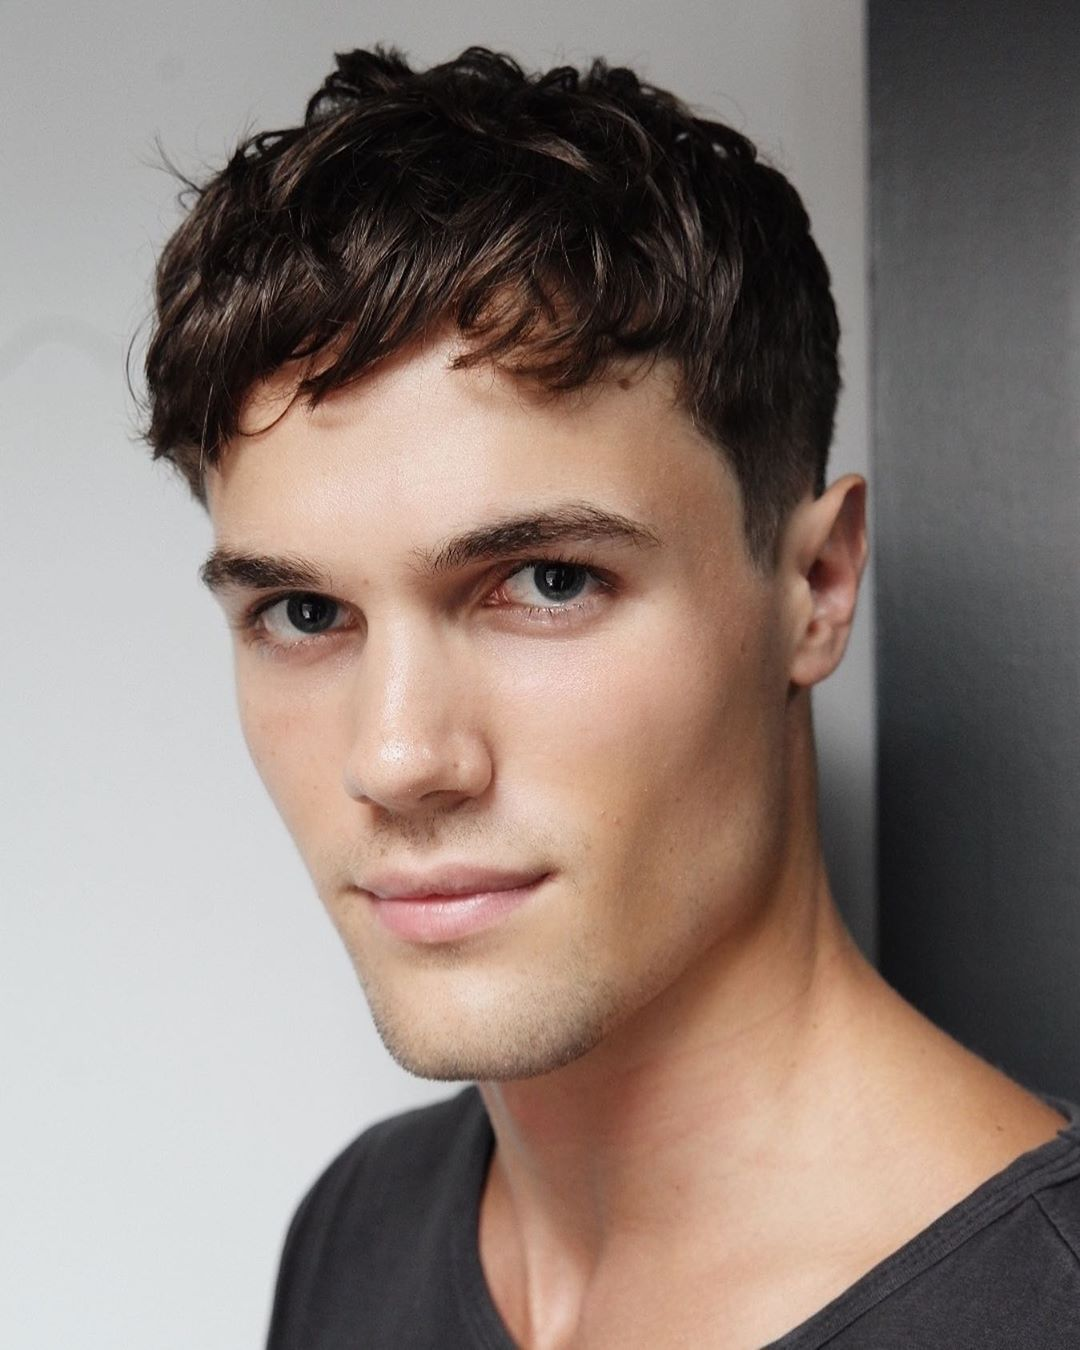 20 Popular Men S Haircuts 2020 Trends Styles Wavy Hair Men Short Textured Hair Haircuts For Men